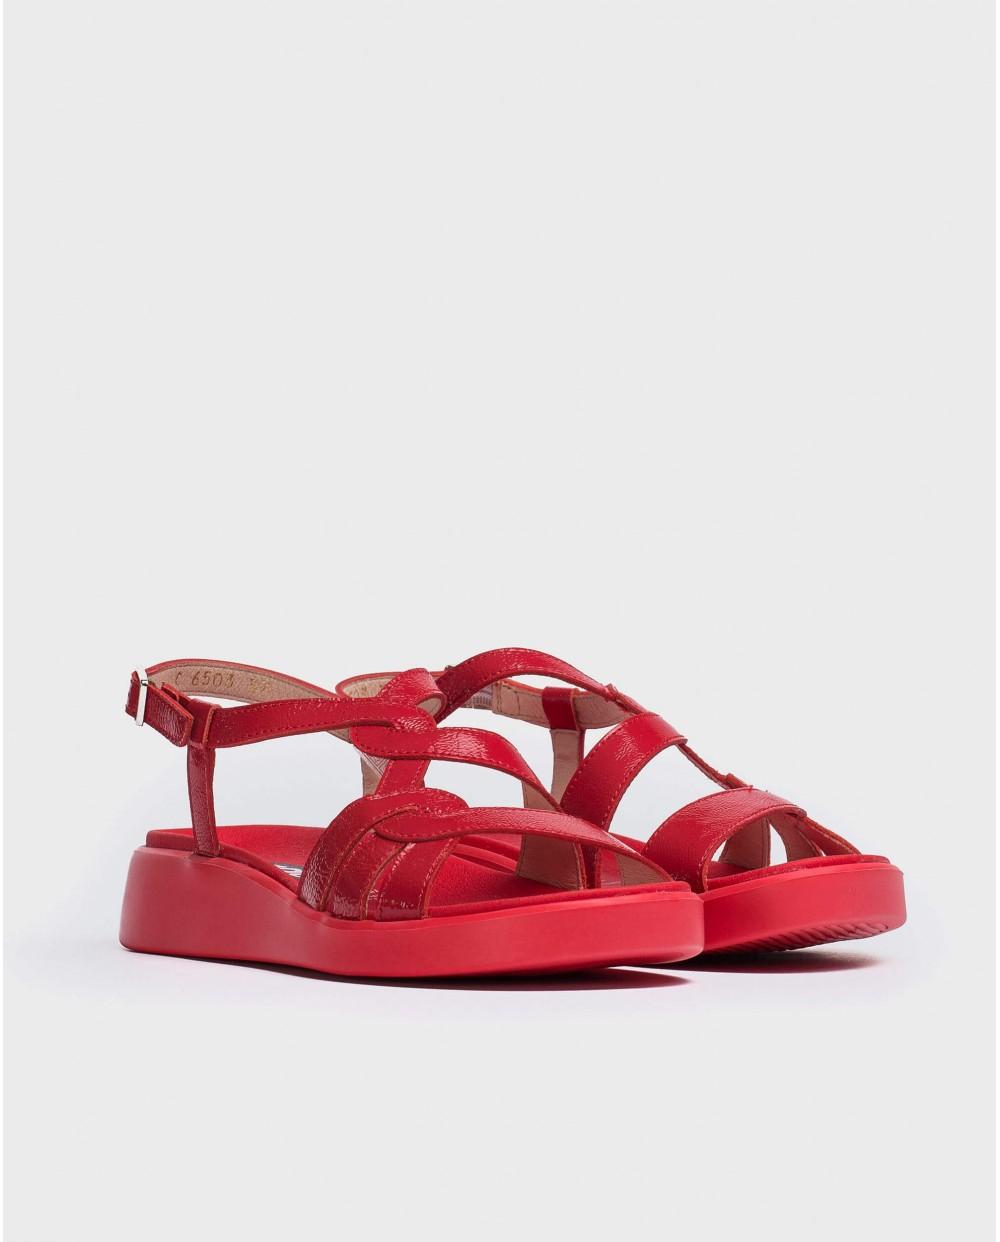 Wonders-Sandals-Sandal with crossed straps